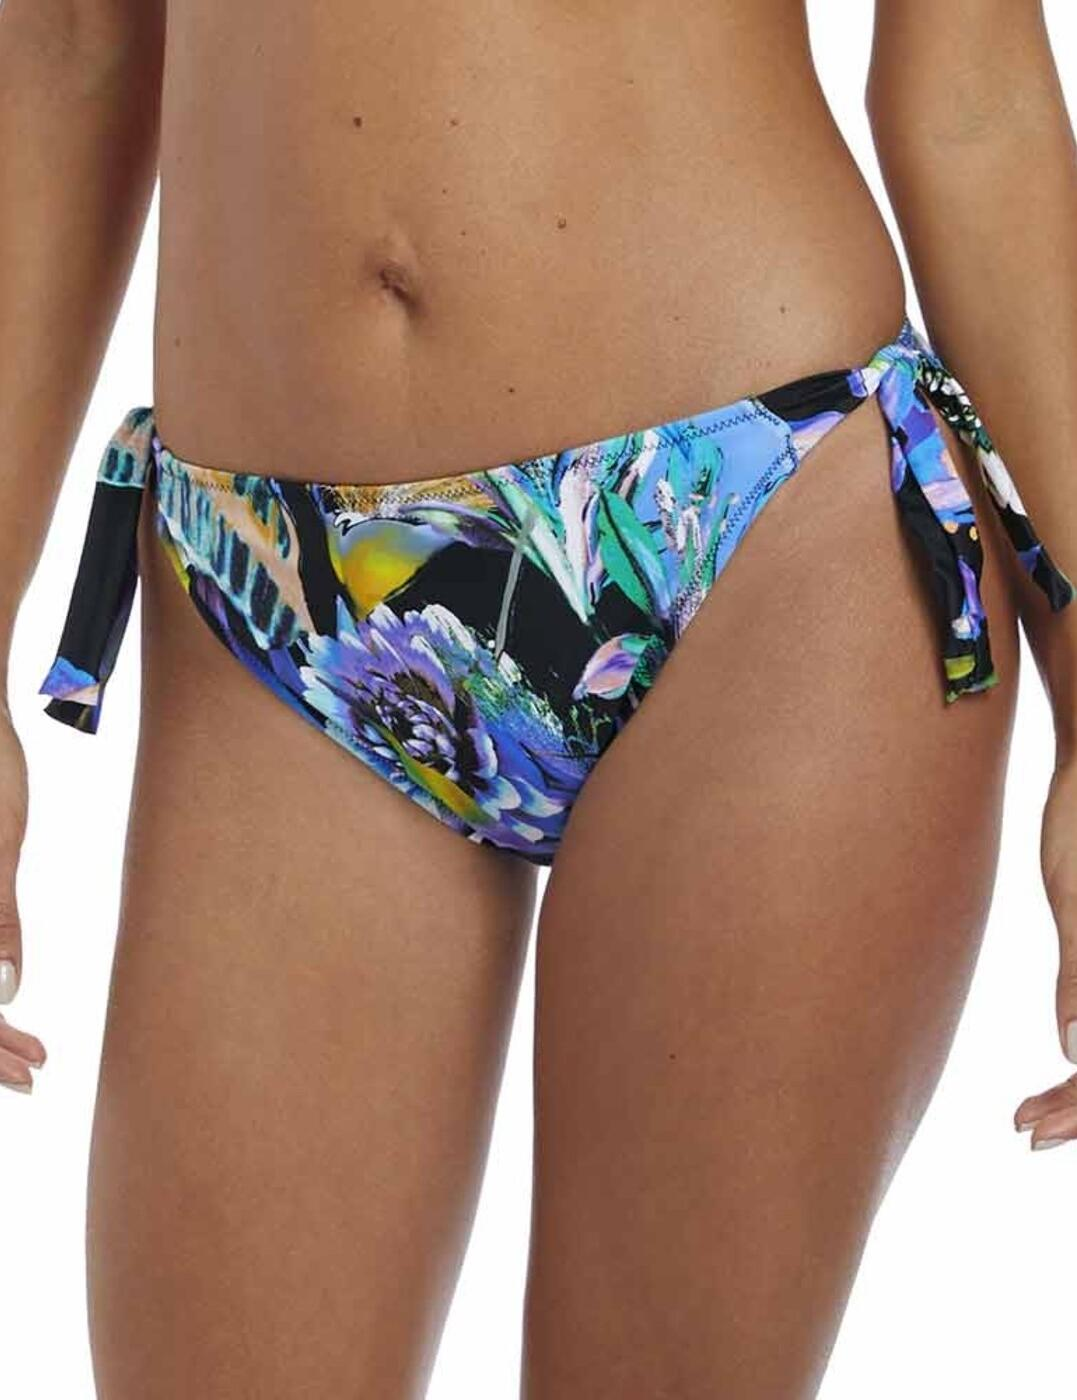 6478 Fantasie Paradise Bay Classic Tie Side Bikini Brief - 6478 Aqua Multi